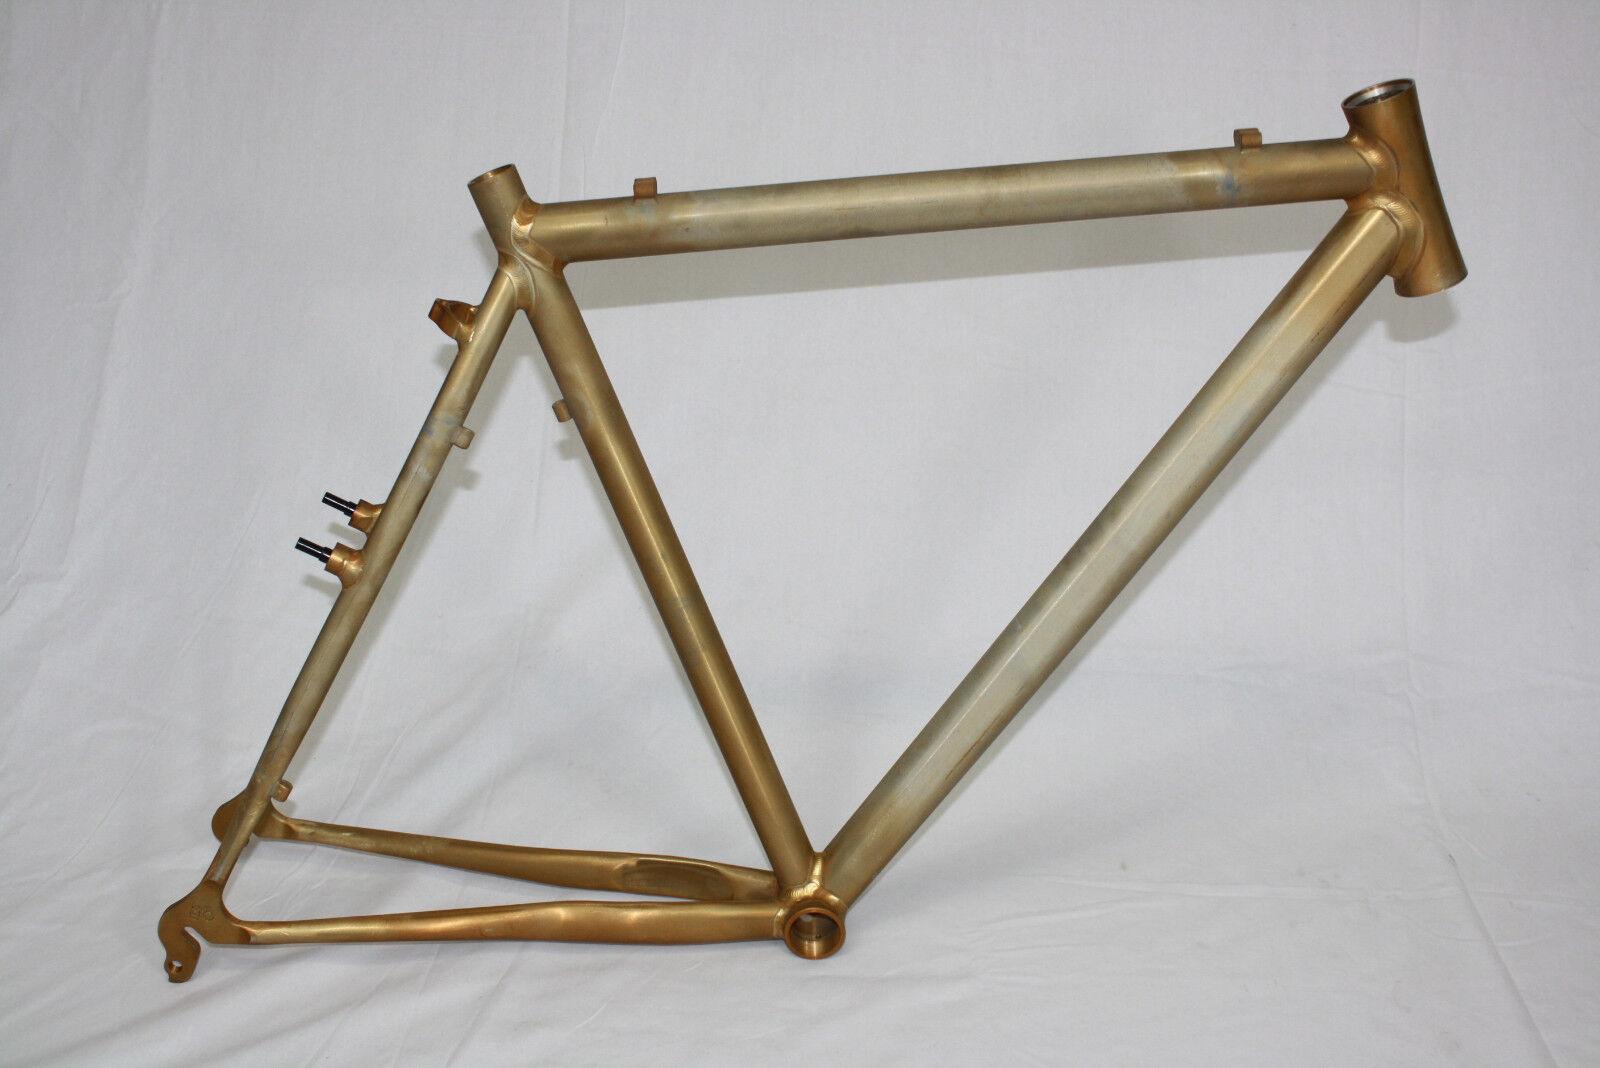 Eddy Merckx QUADRO CROSS 5 gregge, Rahmen frame, HUSKY, ALU Raw, rh58cm